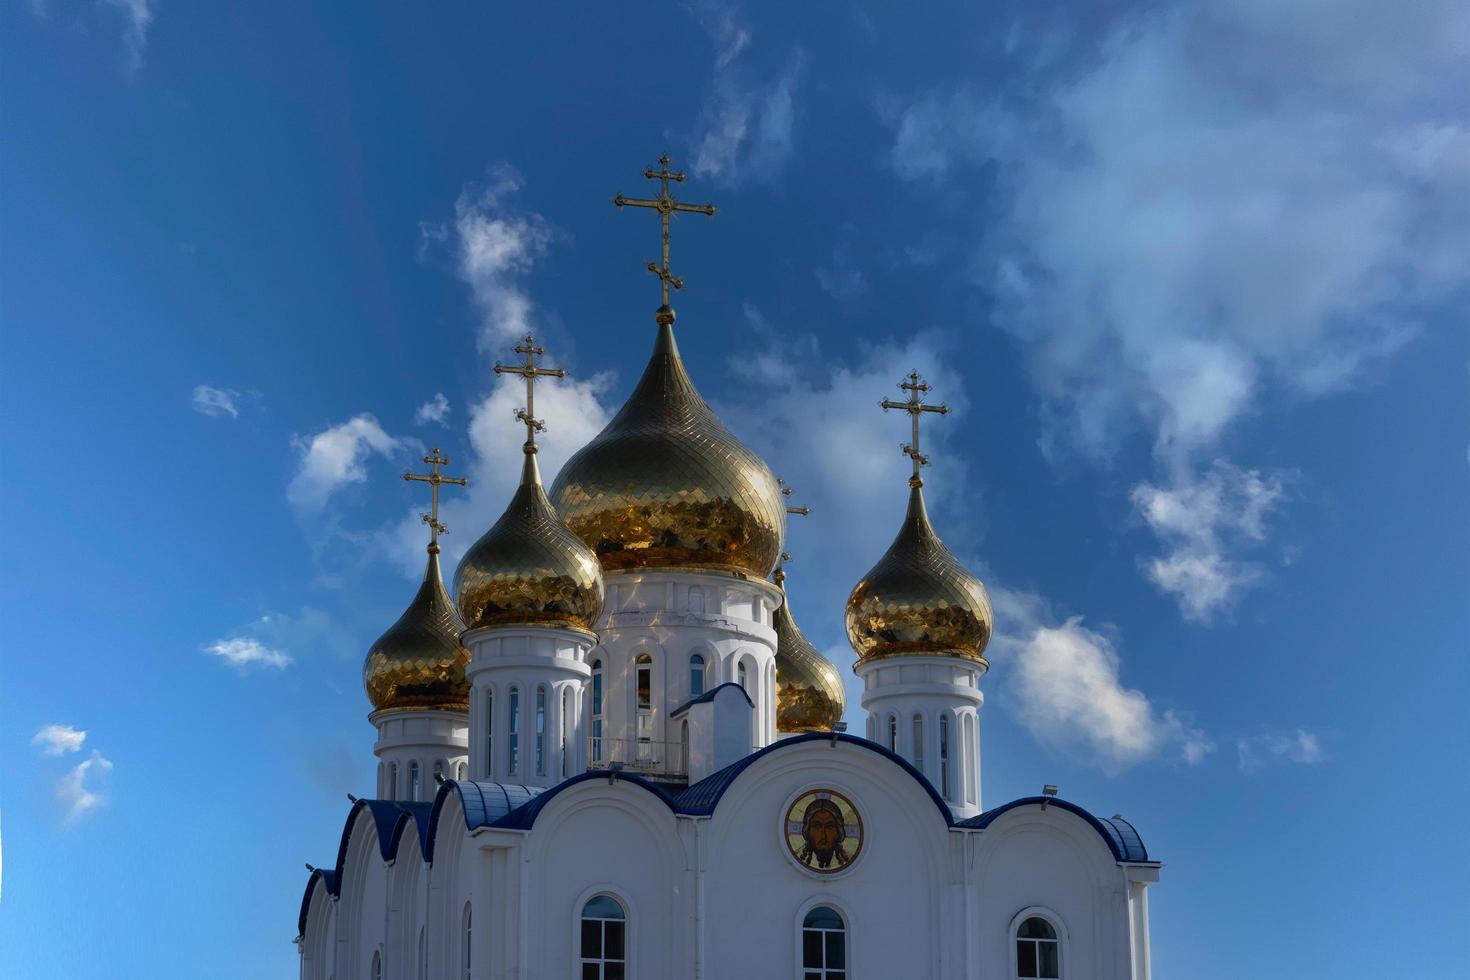 russisch-orthodoxe kathedraal - petropavlovsk-kamchatsky foto